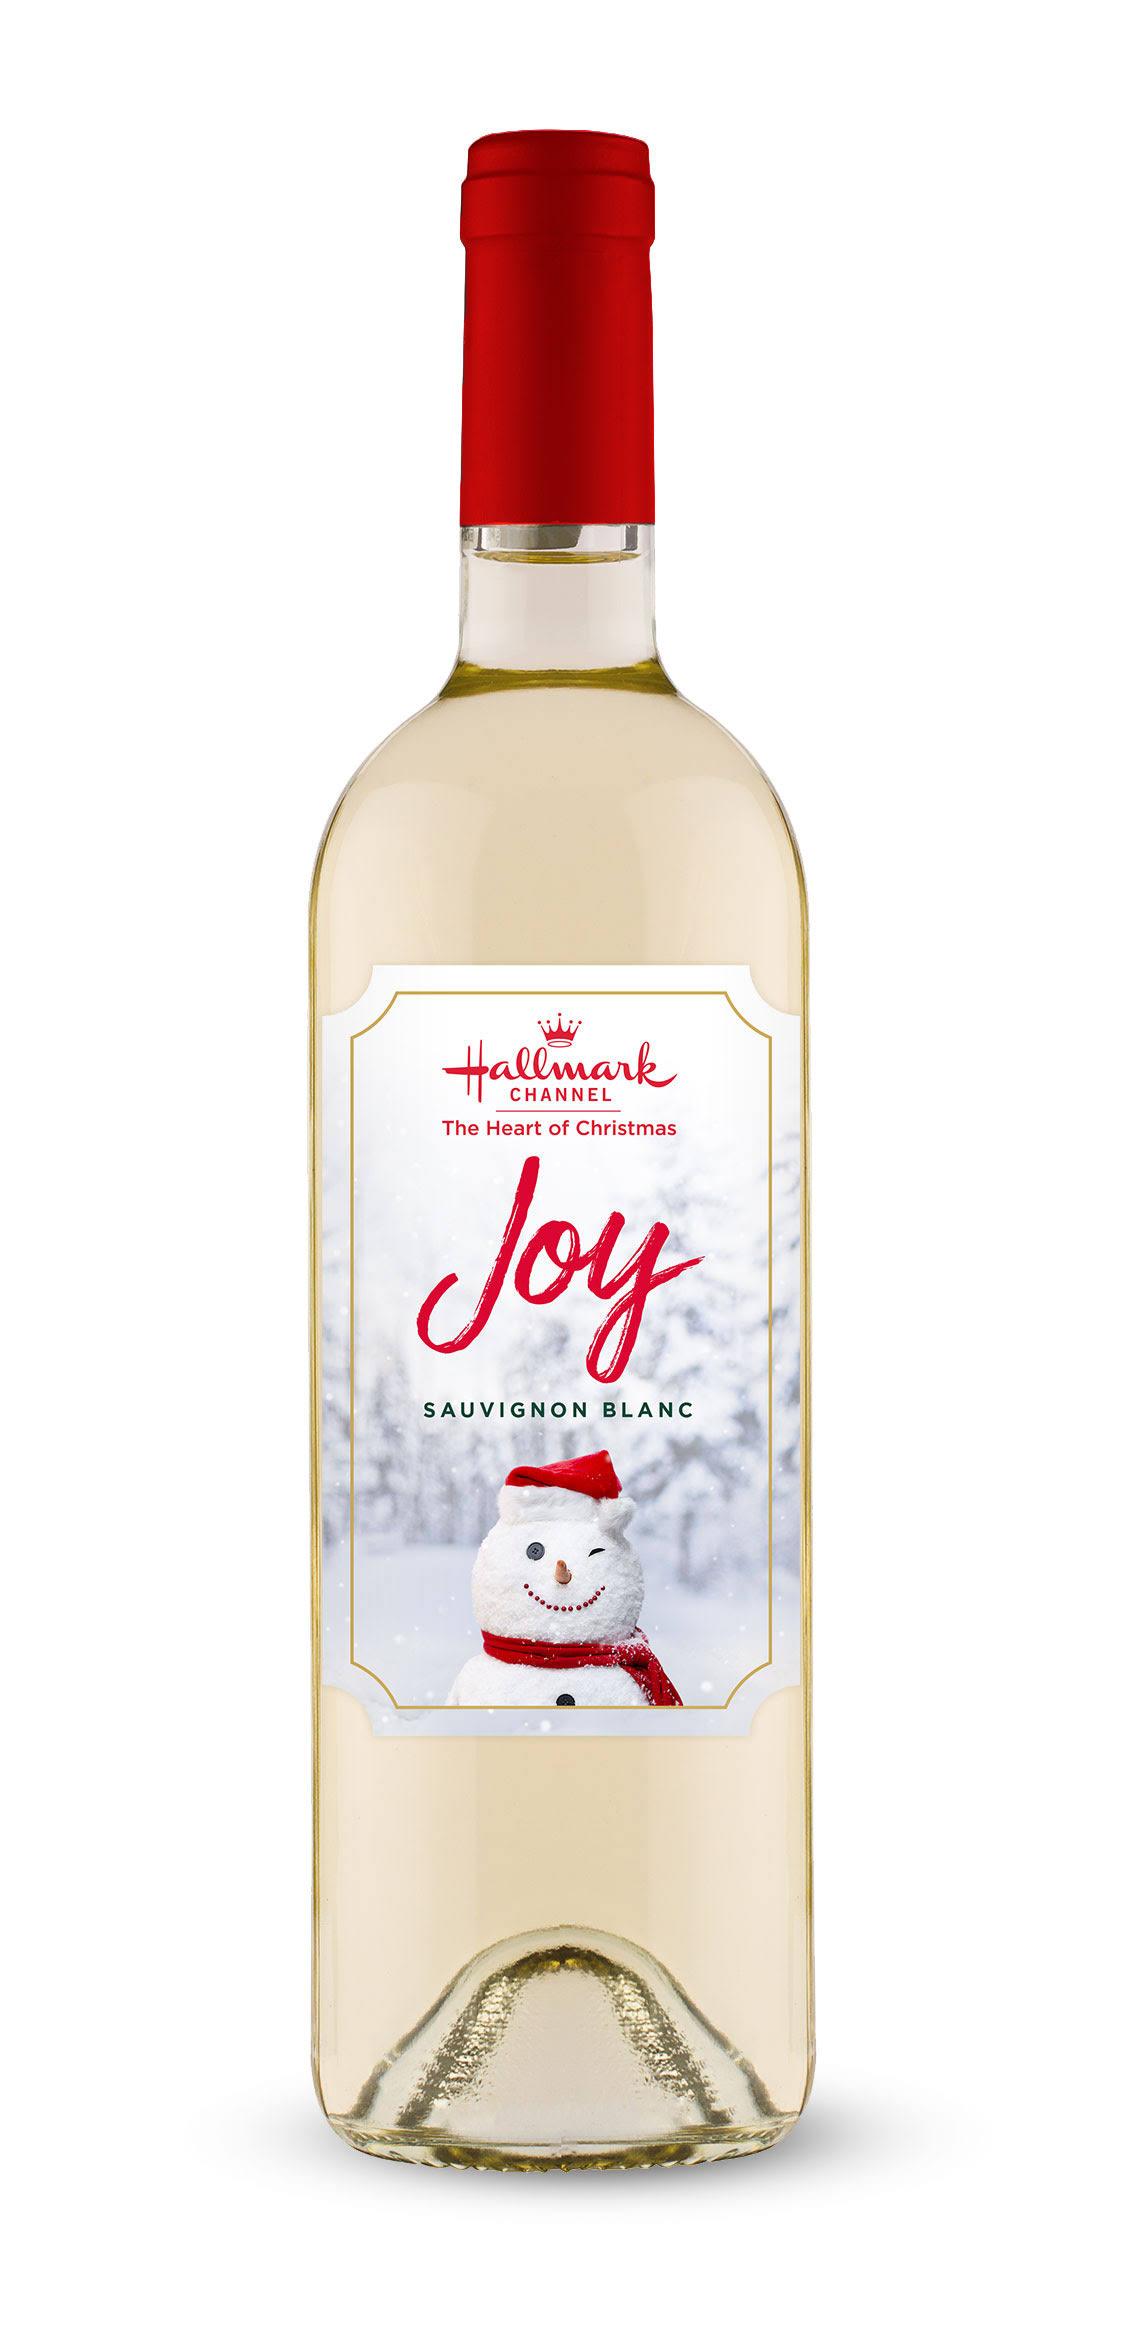 2019 Joy Sauvignon Blanc